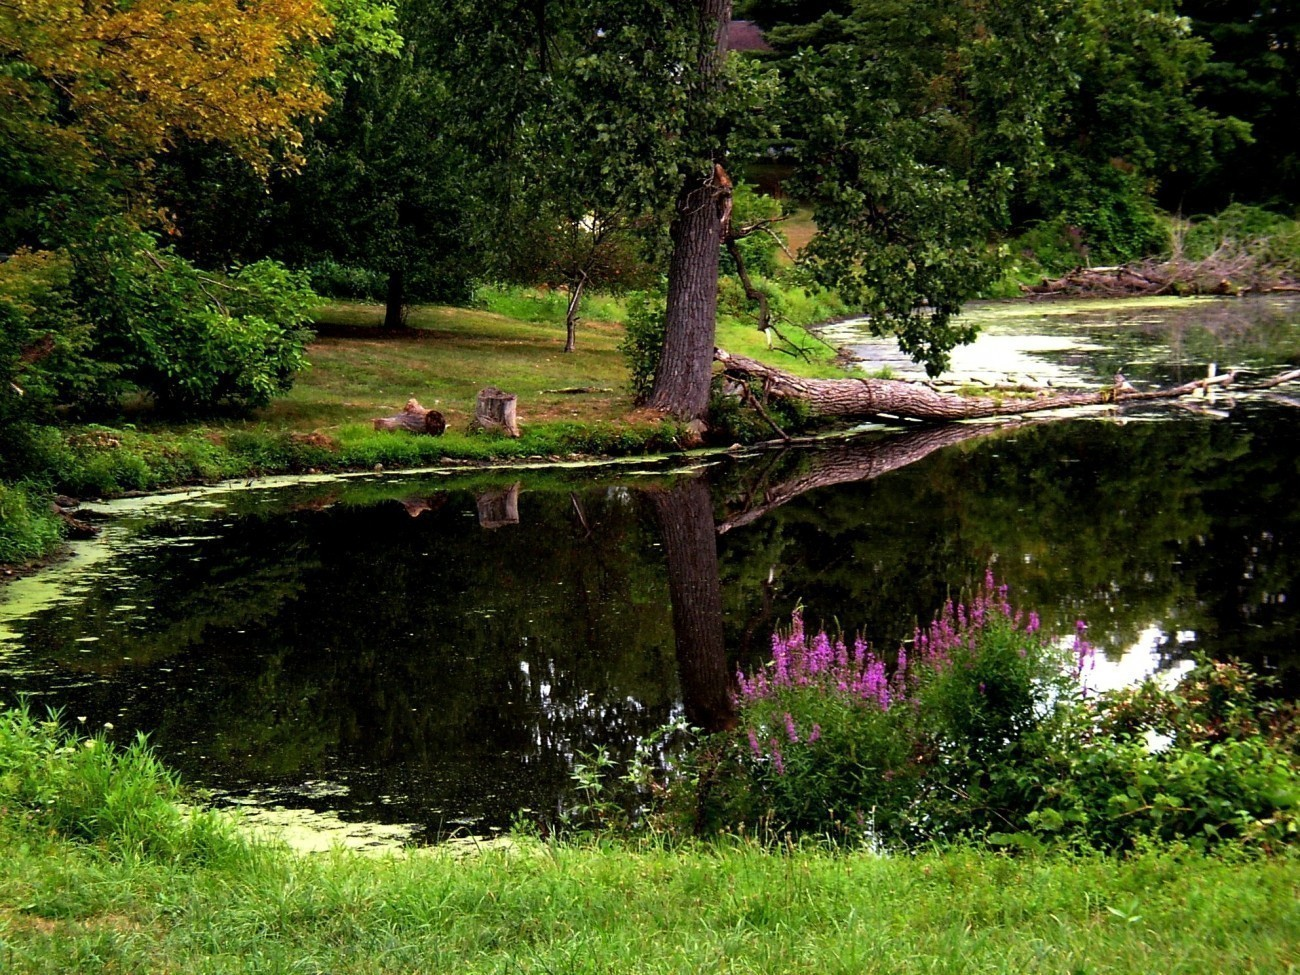 Coopers pond 004-1 (2).JPG